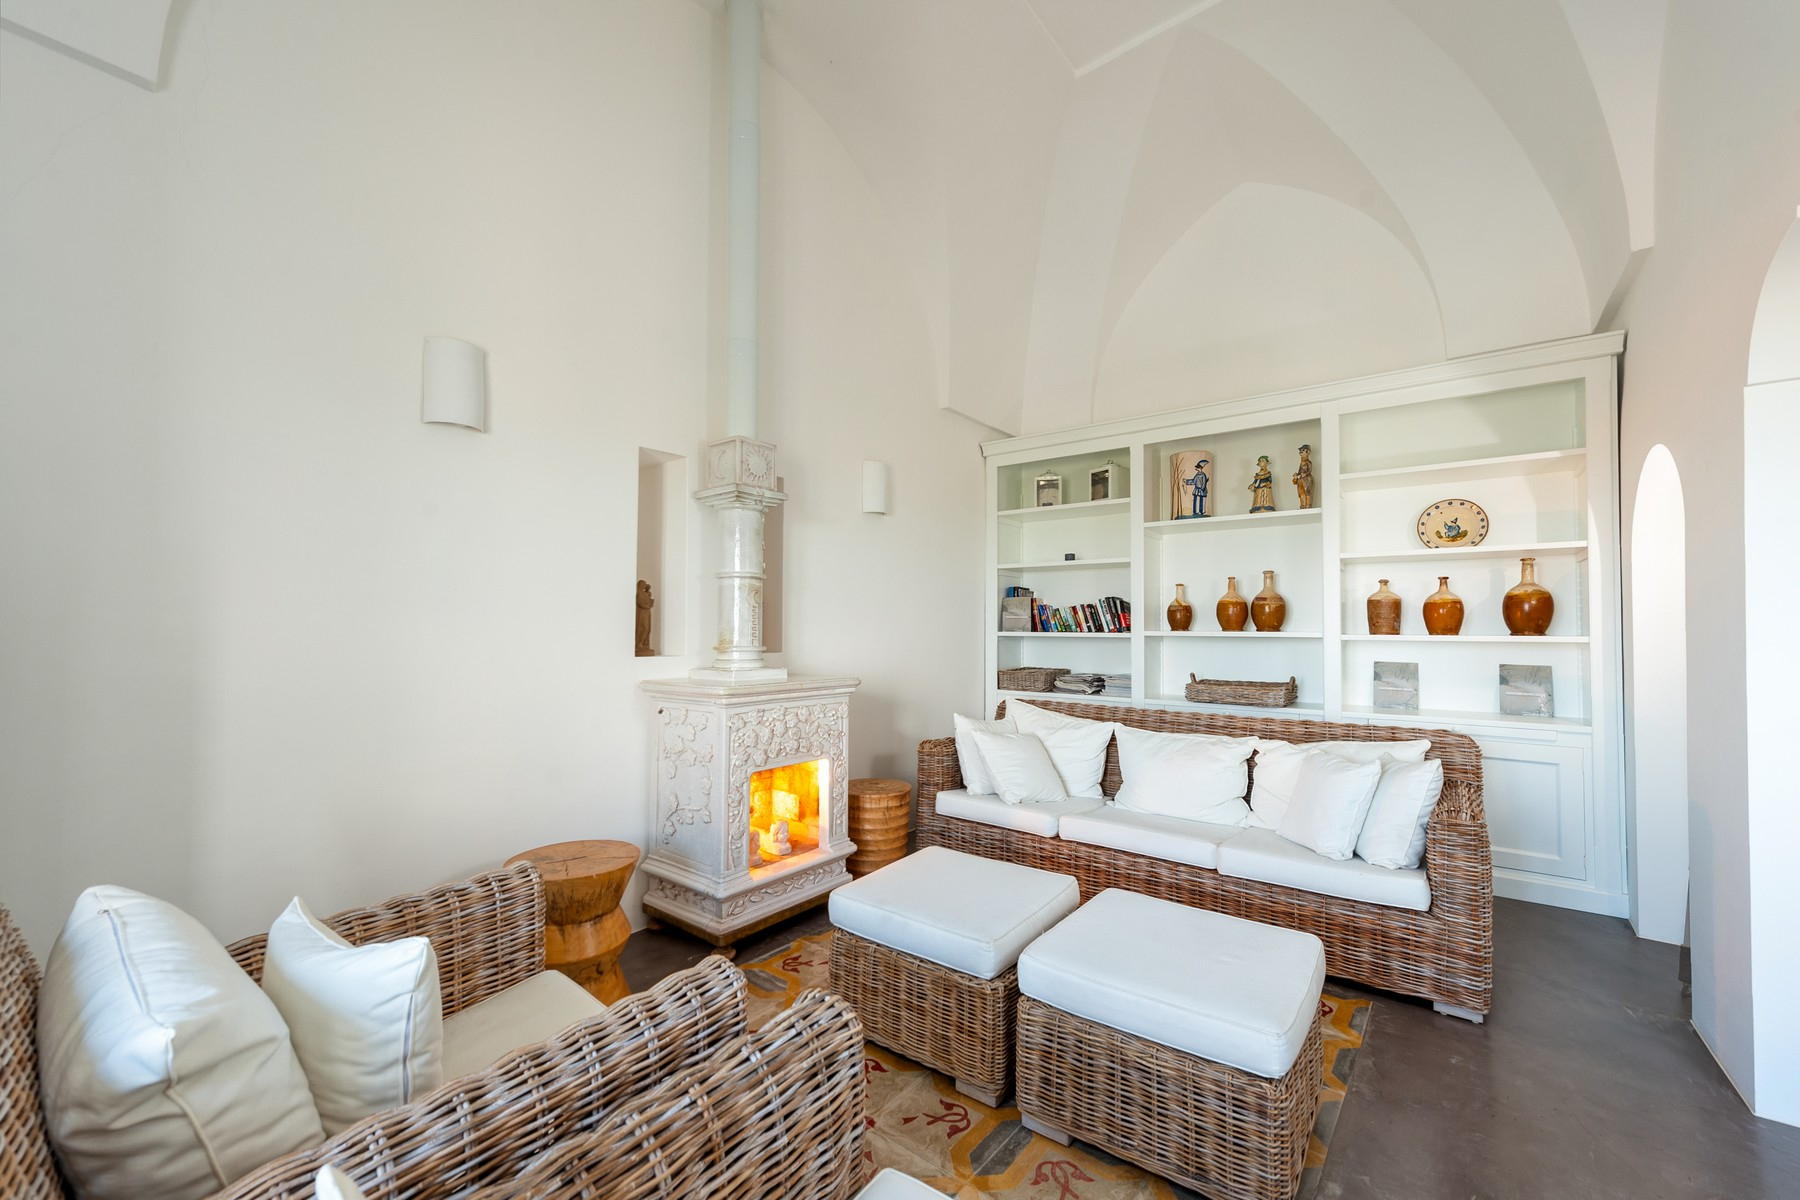 Appartamento in Vendita a Ostuni: 5 locali, 265 mq